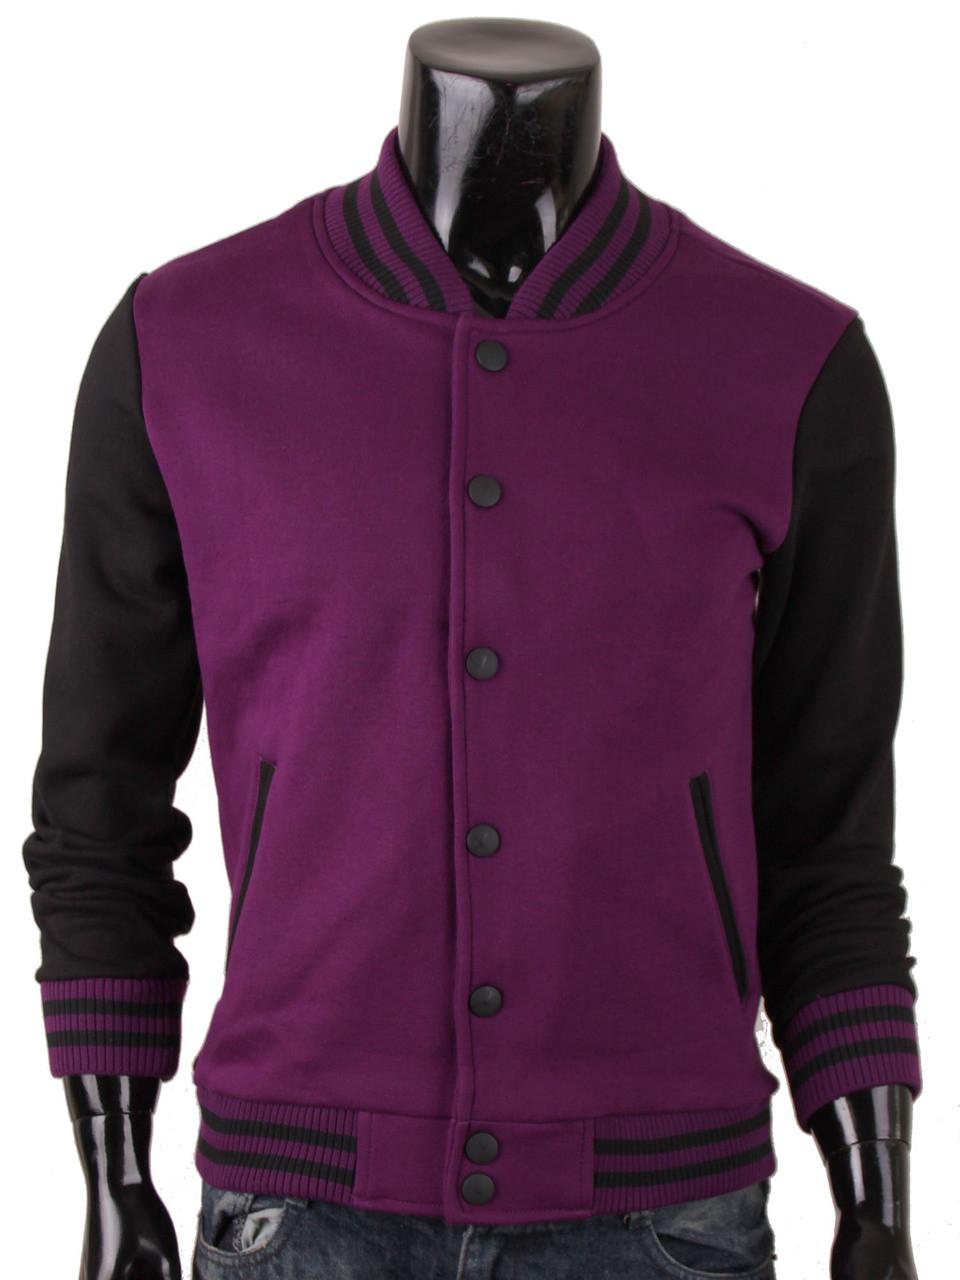 Men's Baseball Jacket Varsity Jacket Sweatshirt Letterman Cotton ...